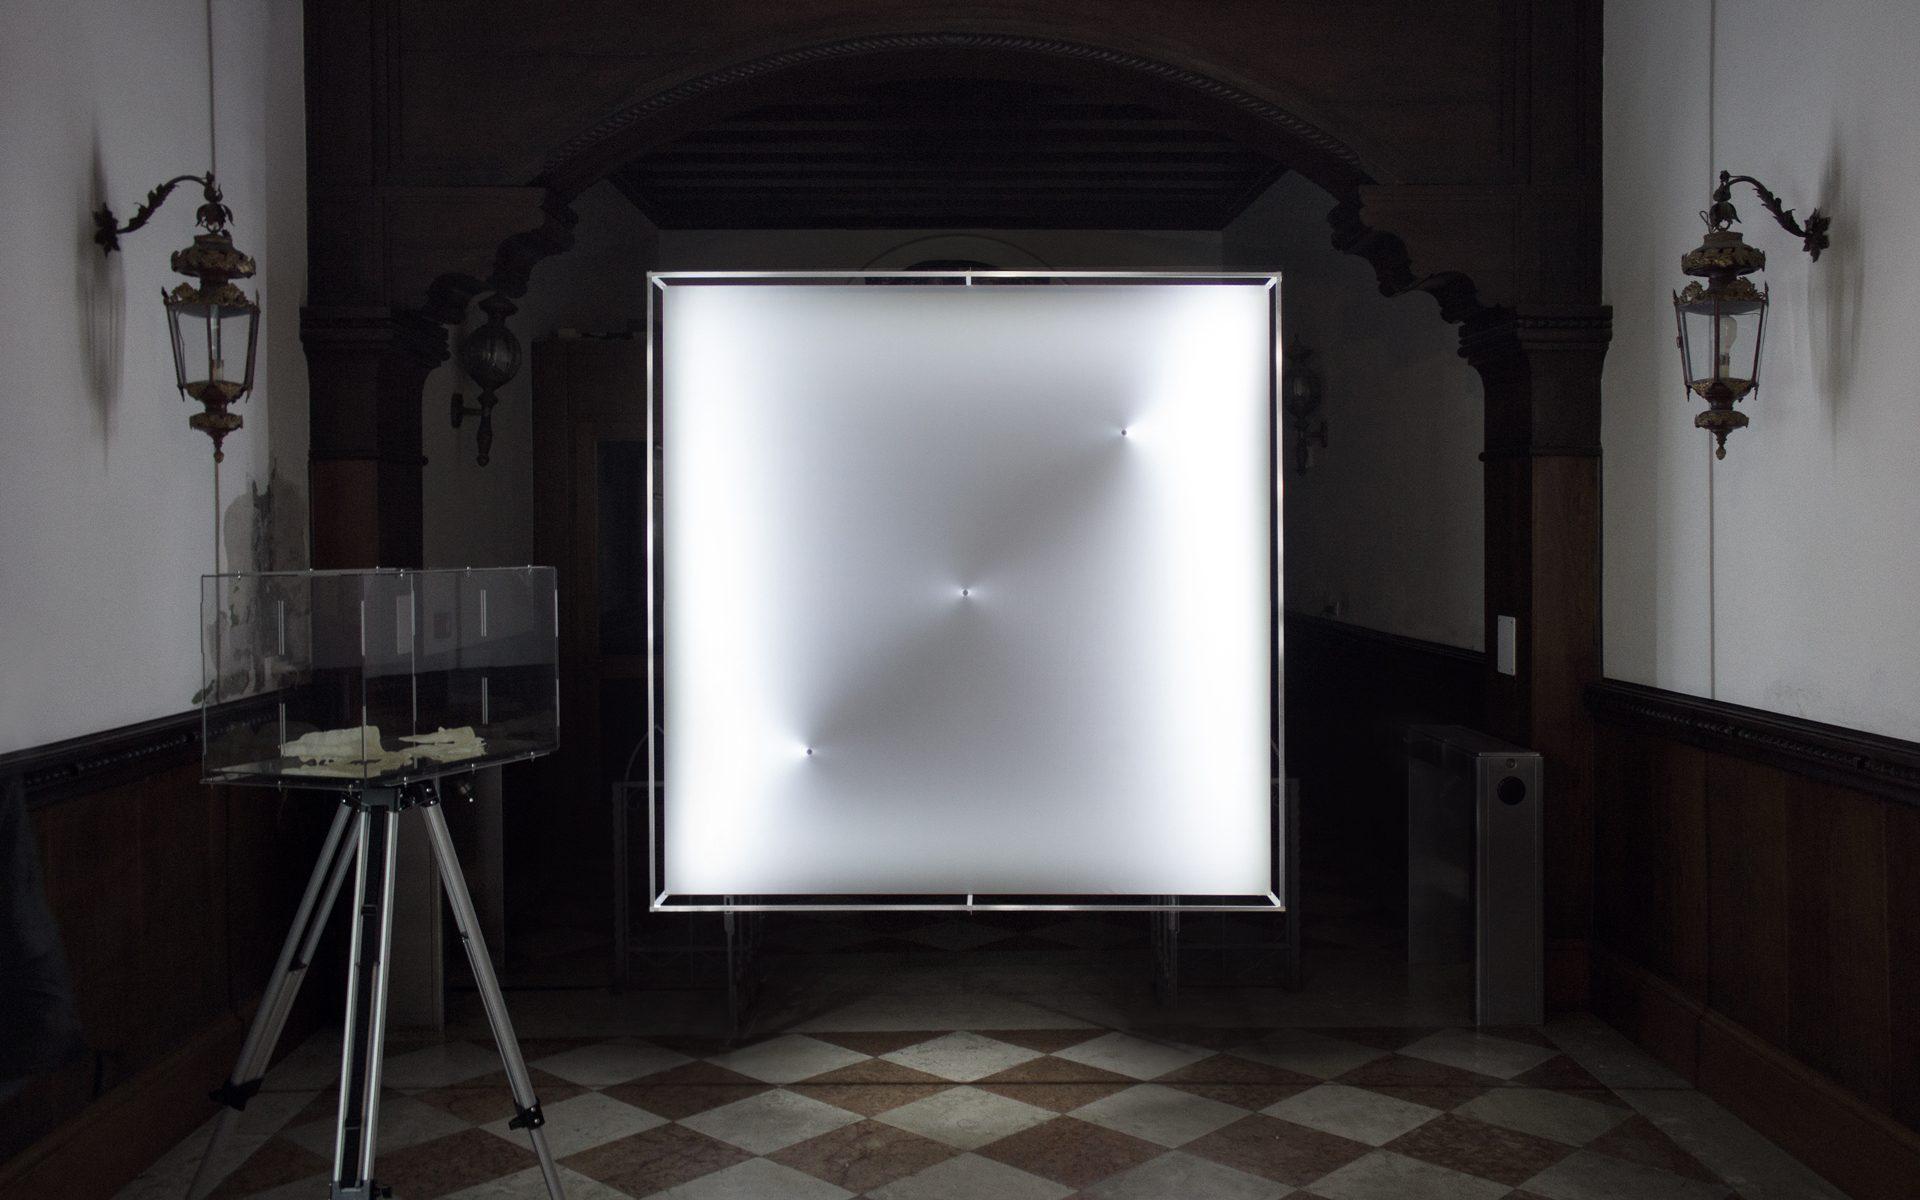 In-situ at Antarctic Pavilion (57th Venice Biennale), Venice / Italy (Hgdnt)